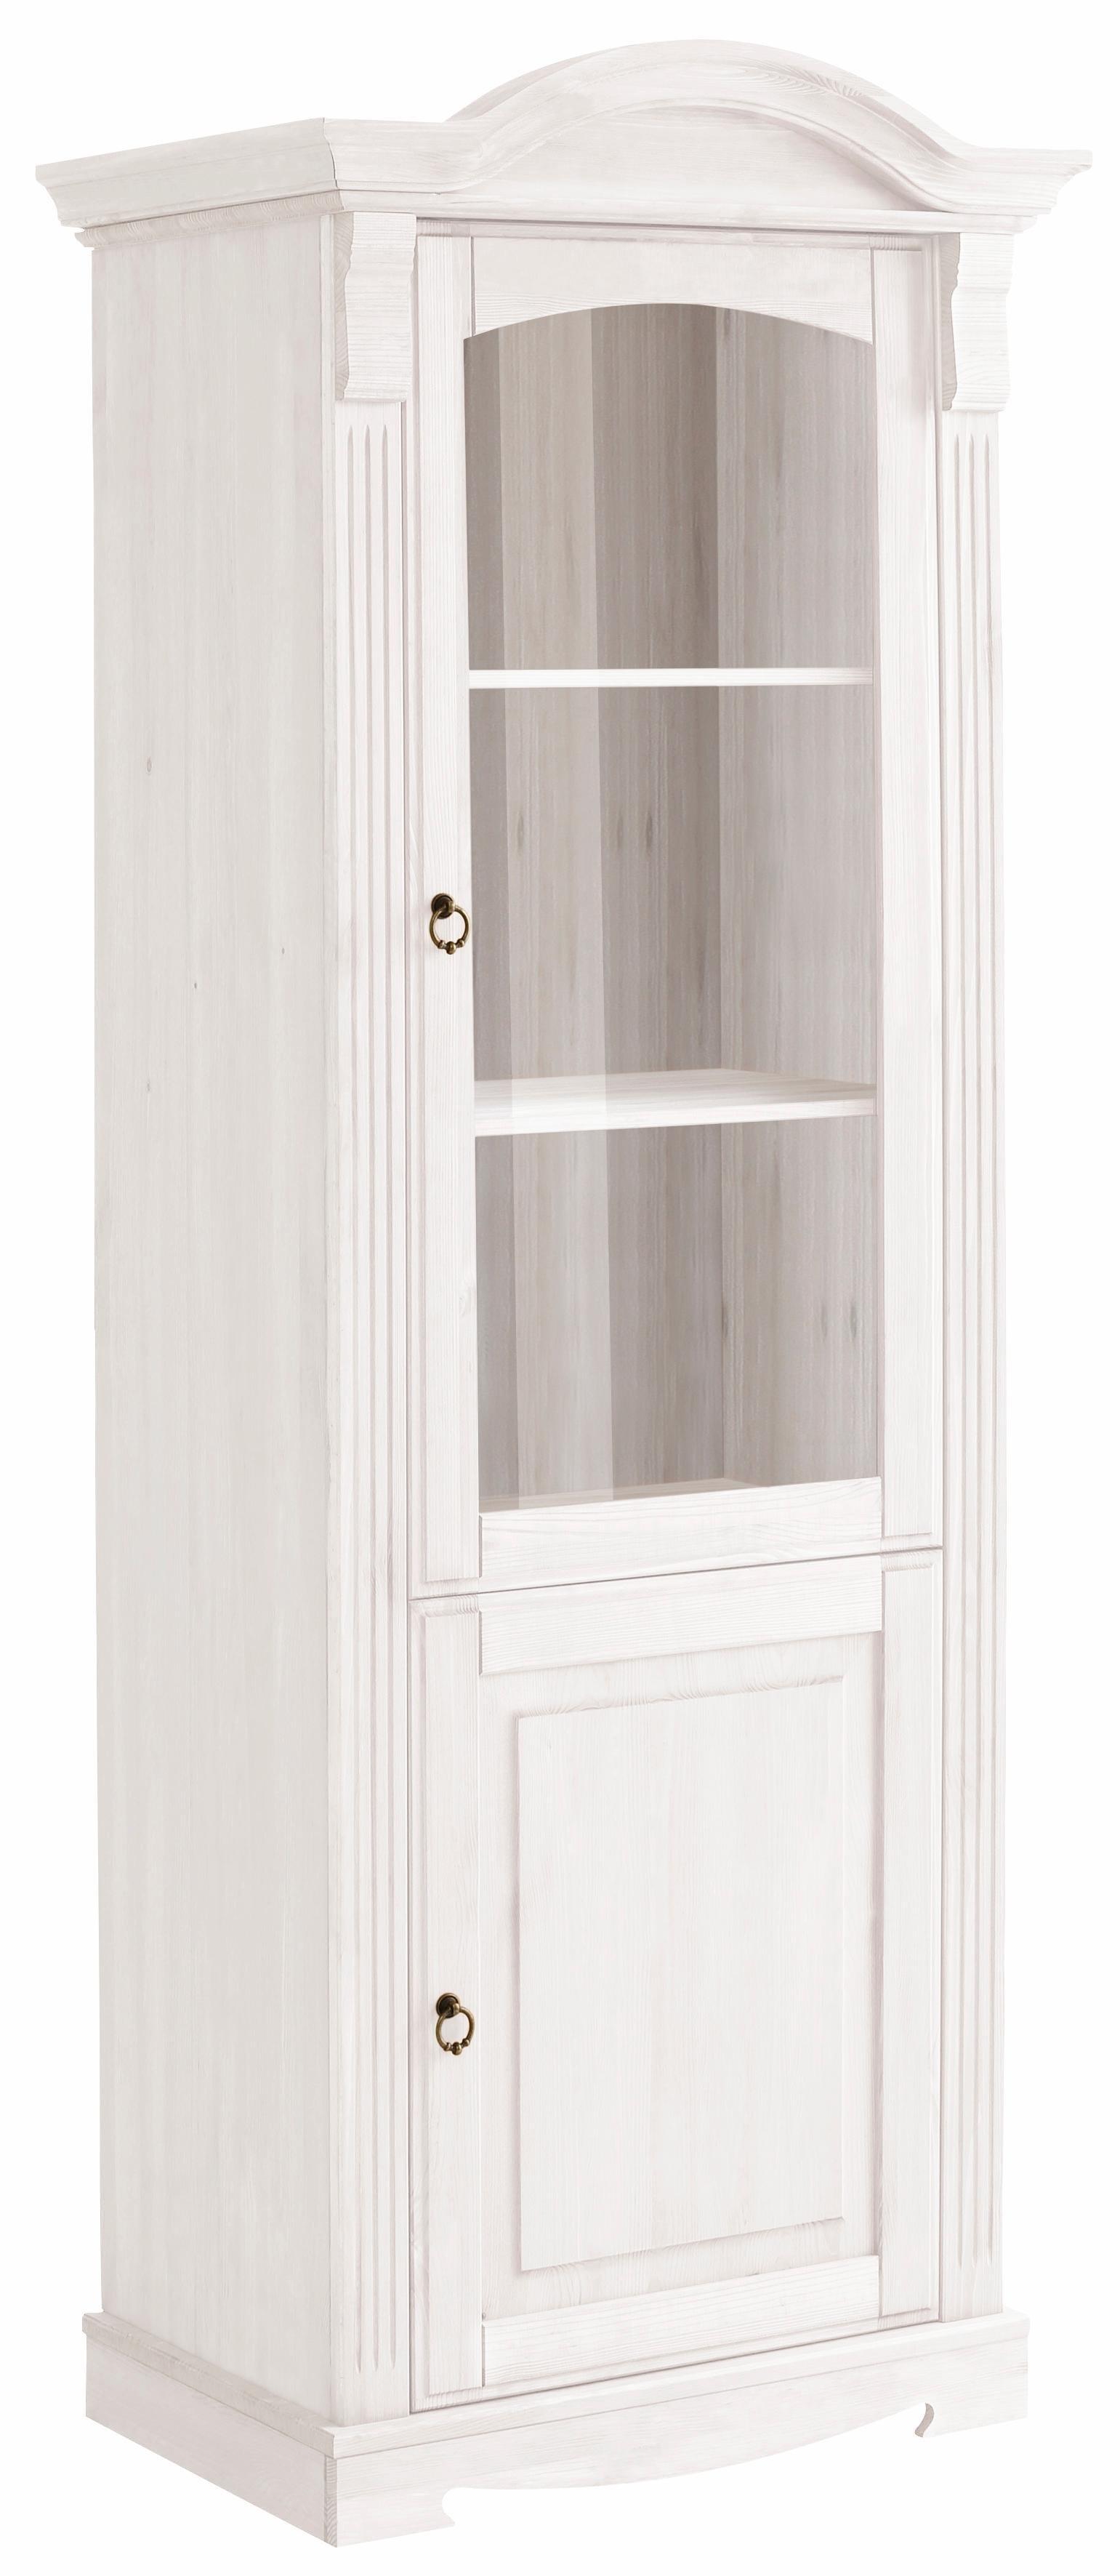 Home Affaire vitrinekast 2-deurs »Anna«, breedte 69 cm nu online bestellen